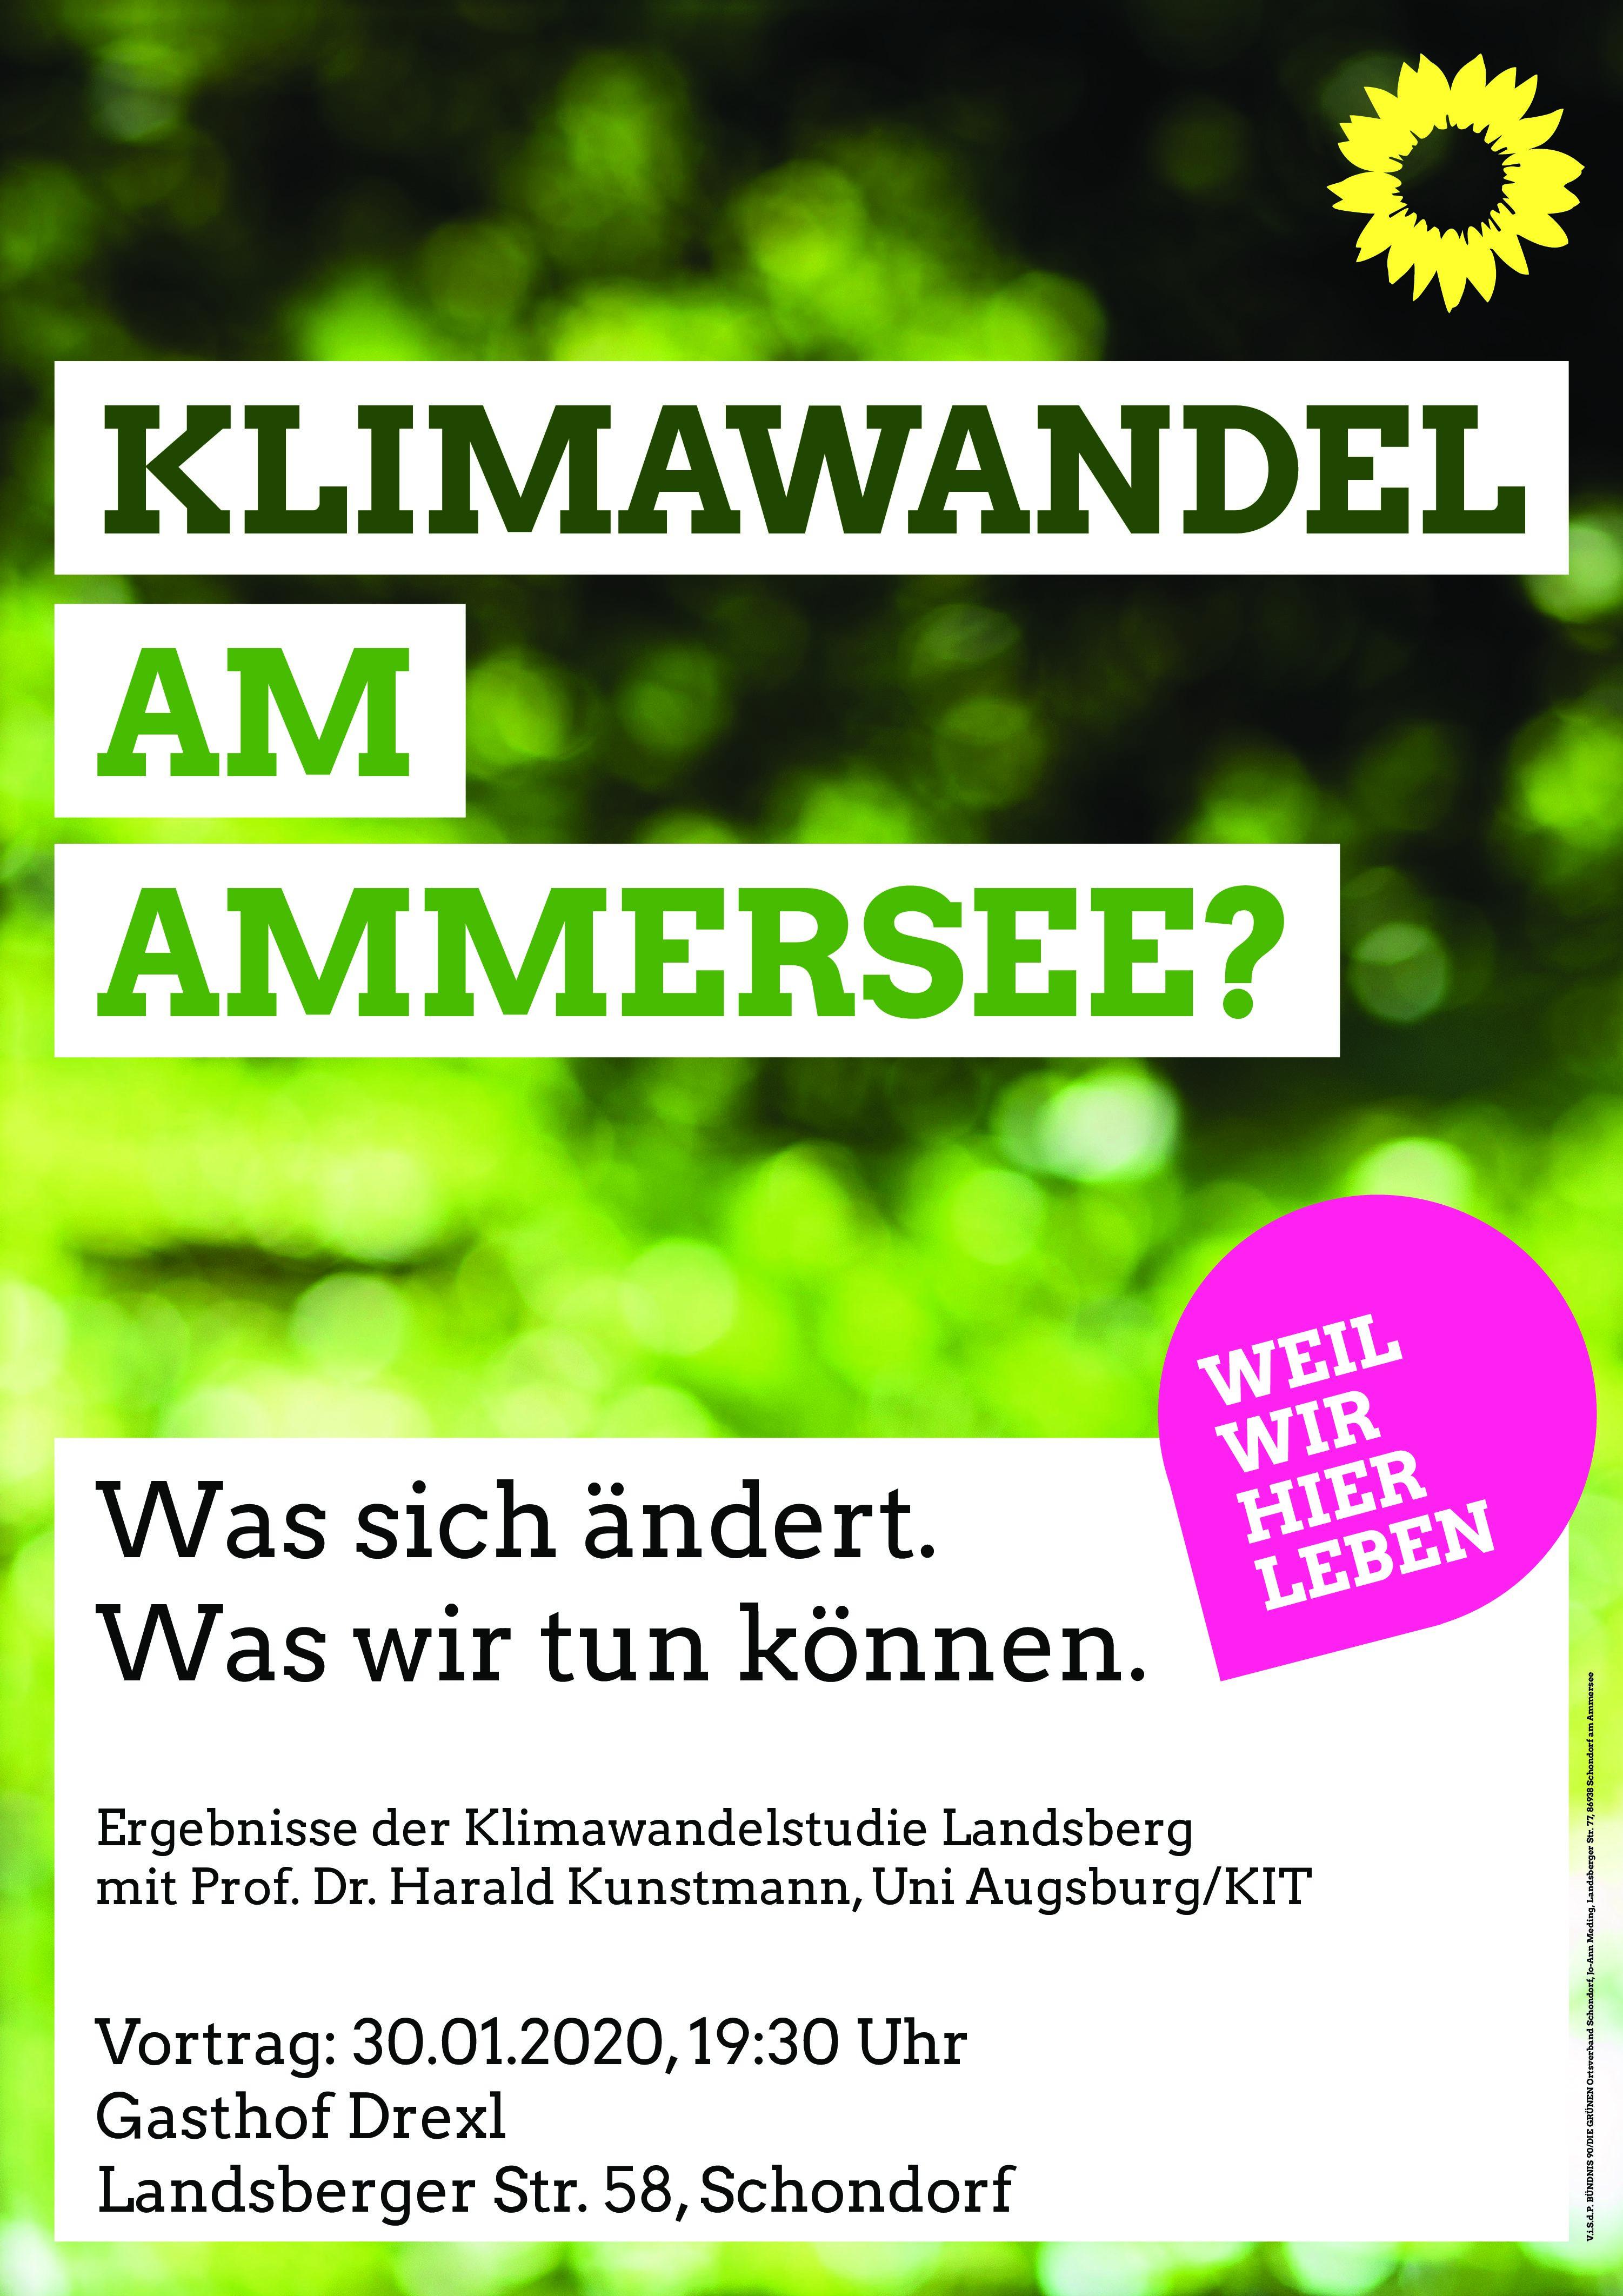 Klimawandel am Ammersee?